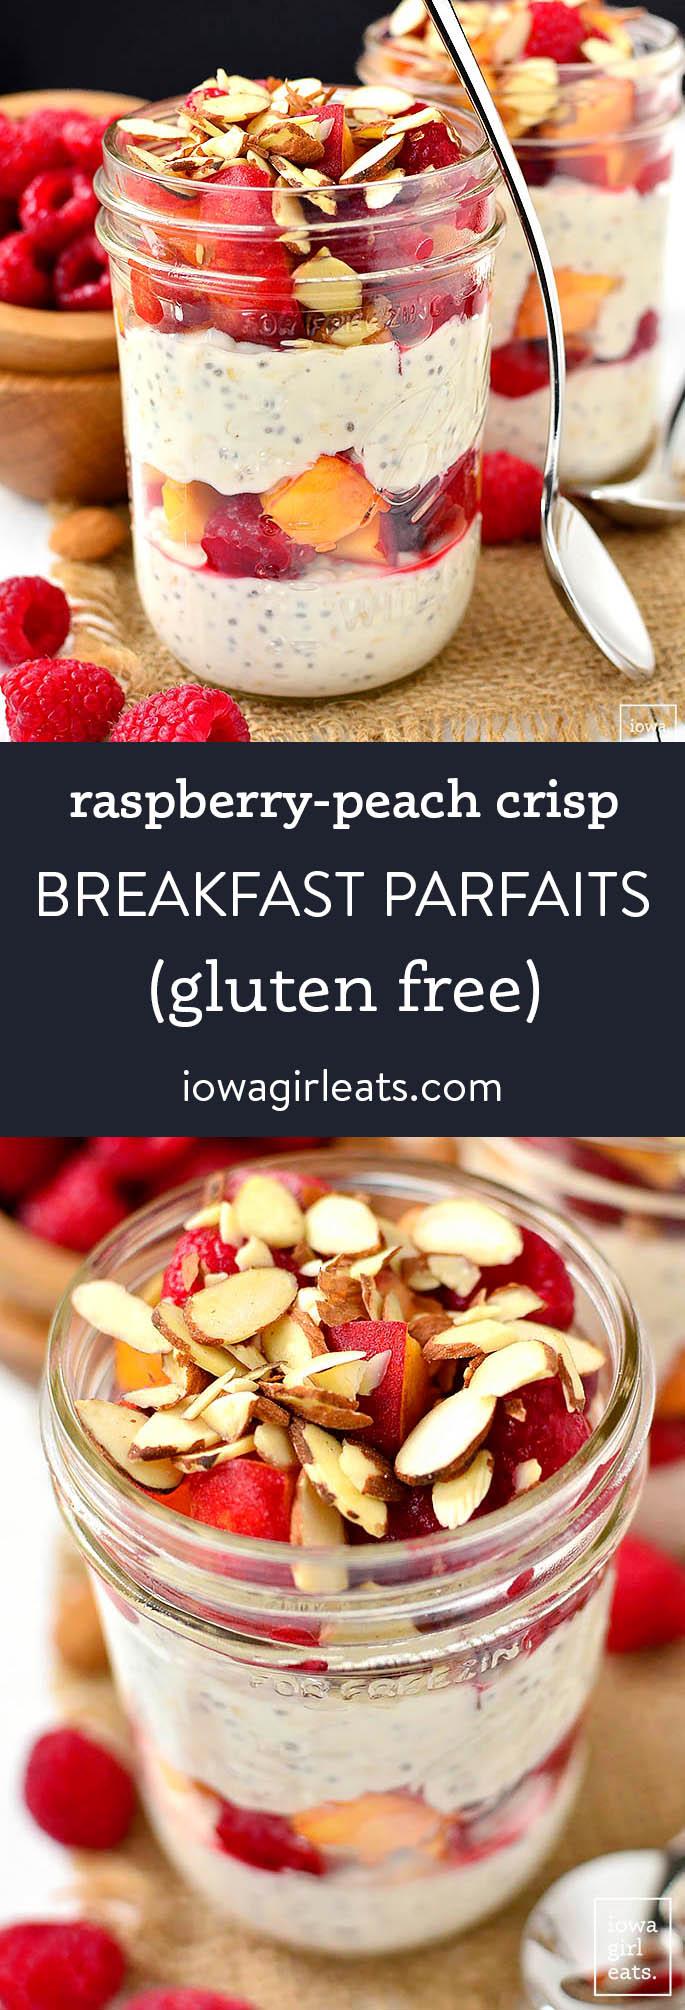 Photo collage of raspberry peach crisp breakfast parfaits